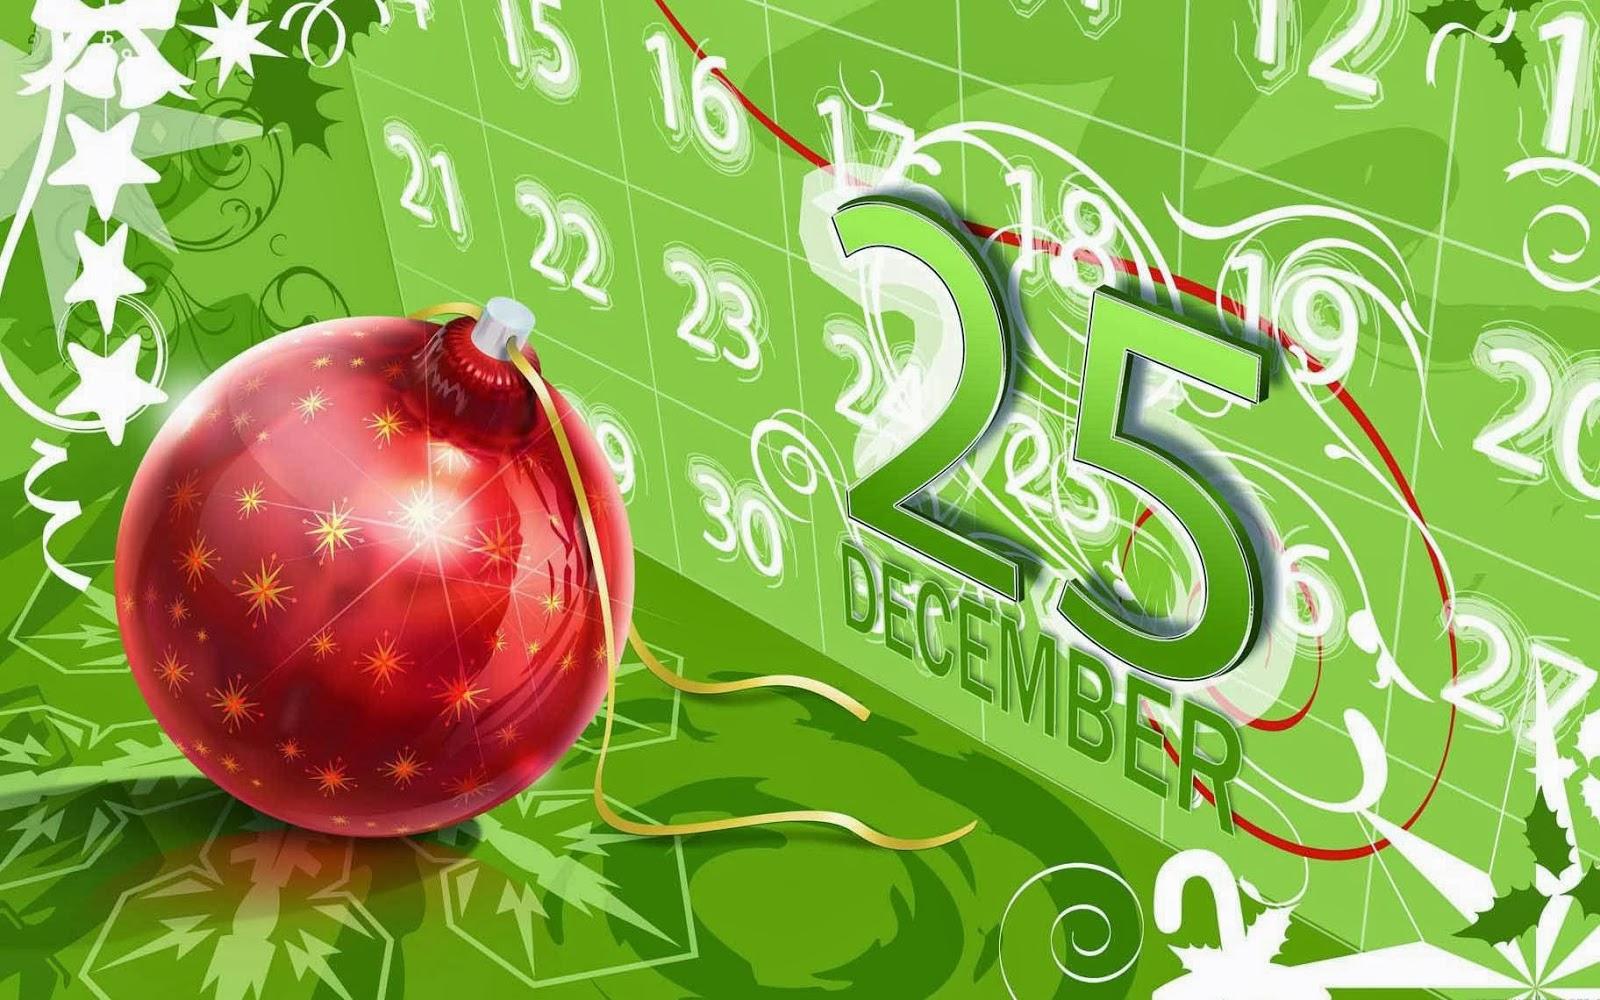 merry christmas countdown desktop wallpaper